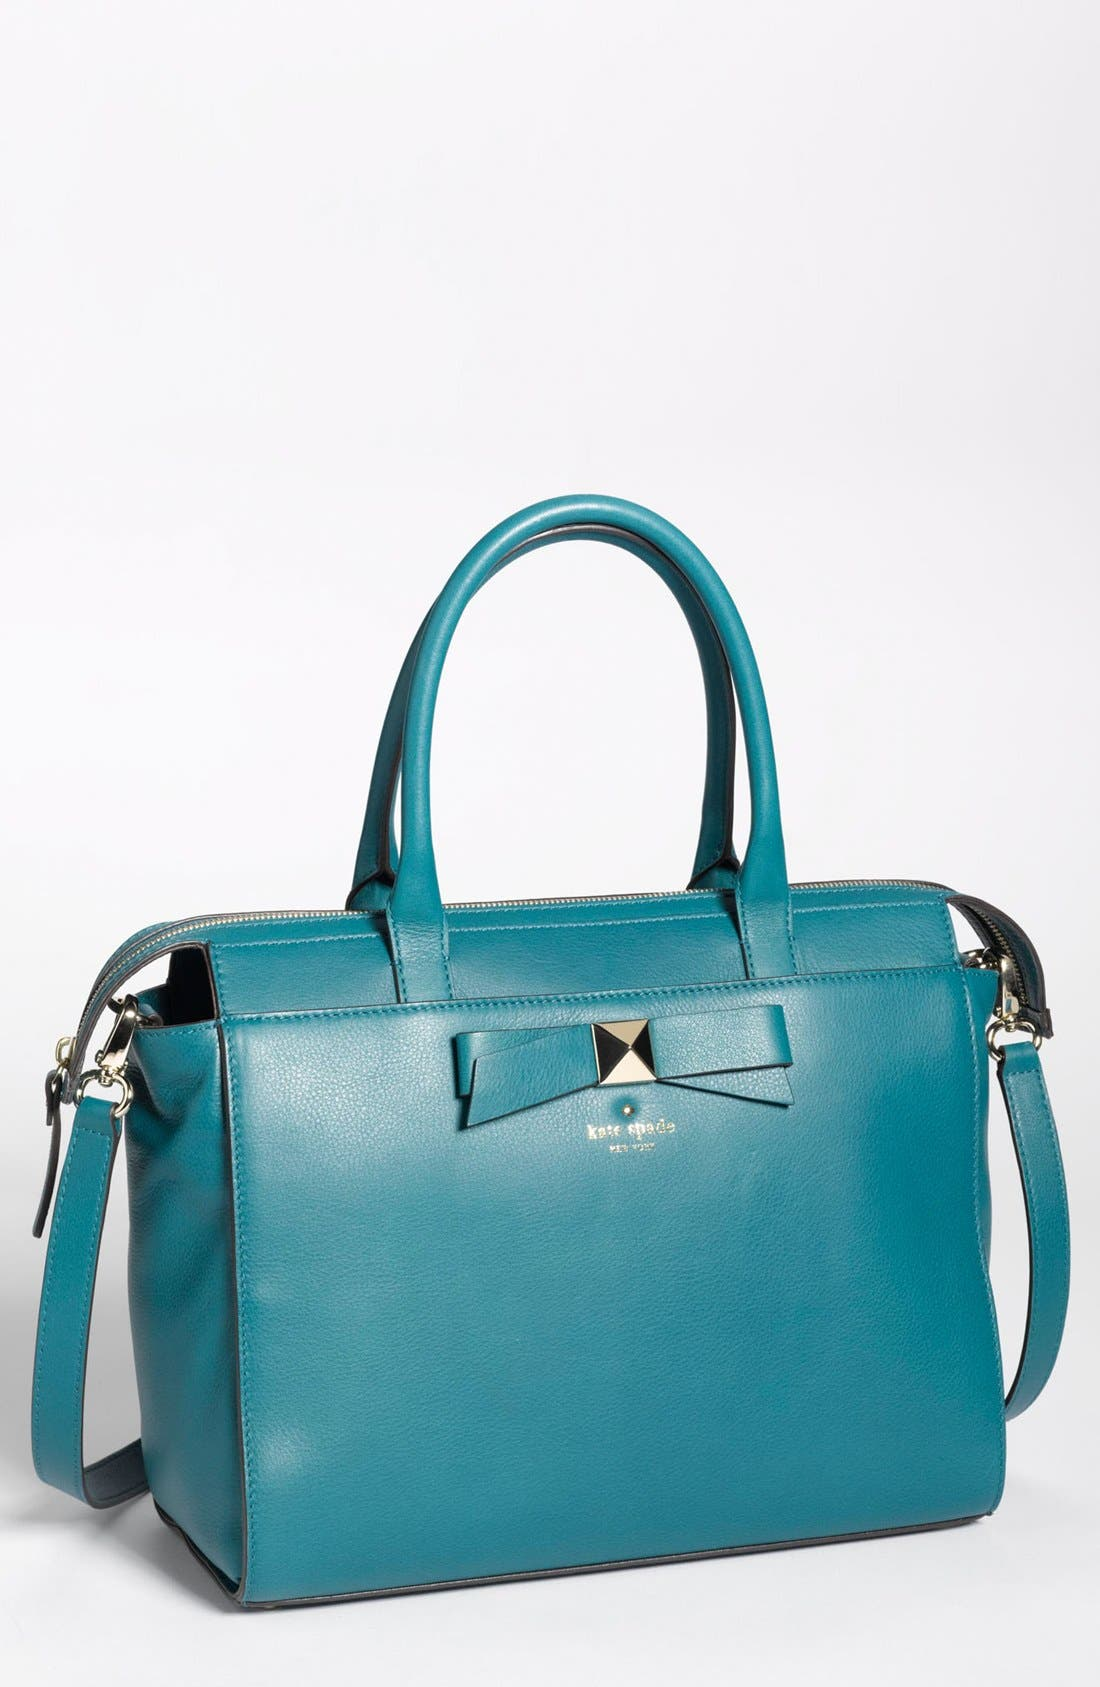 Main Image - kate spade new york 'hancock park - jeanne' leather satchel, medium